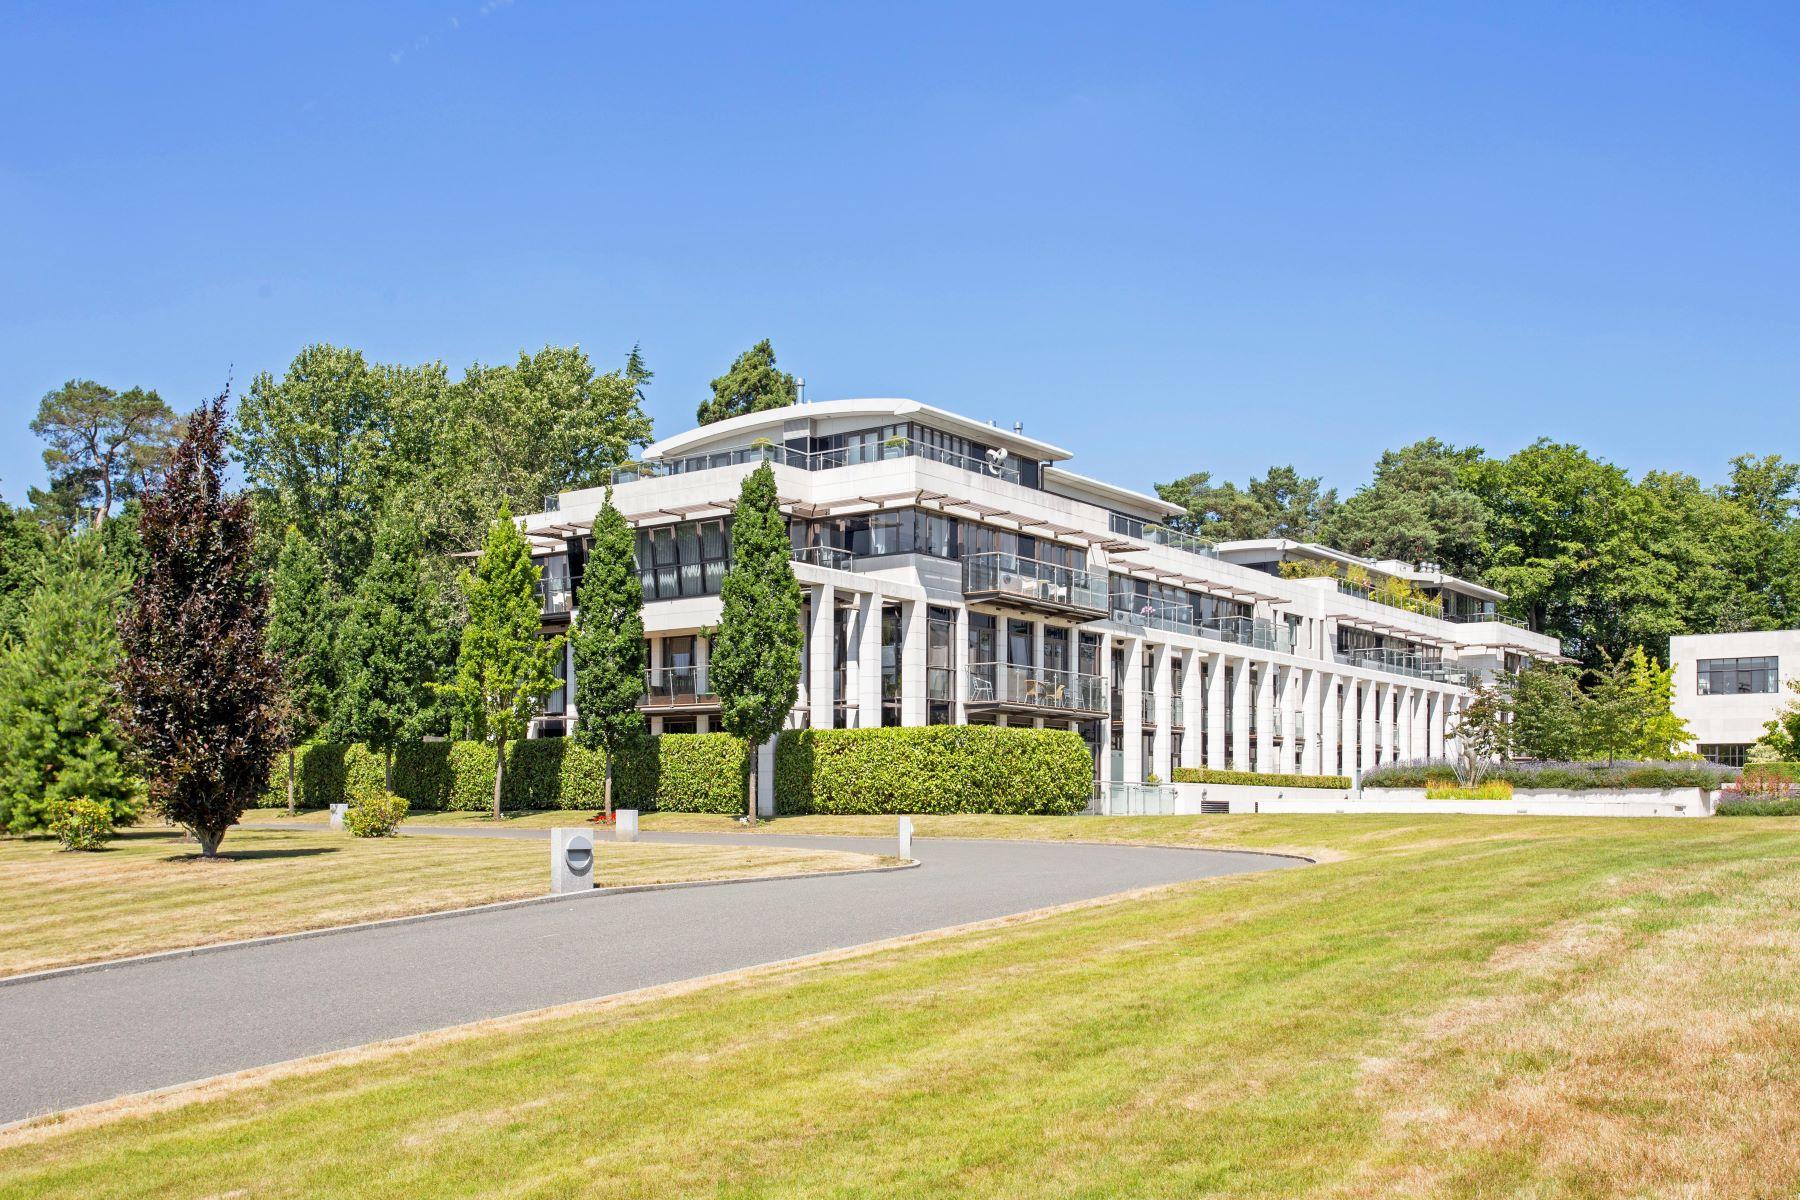 Duplex Homes for Sale at The Mackintosh Charters Court Ascot, England SL5 9FG United Kingdom